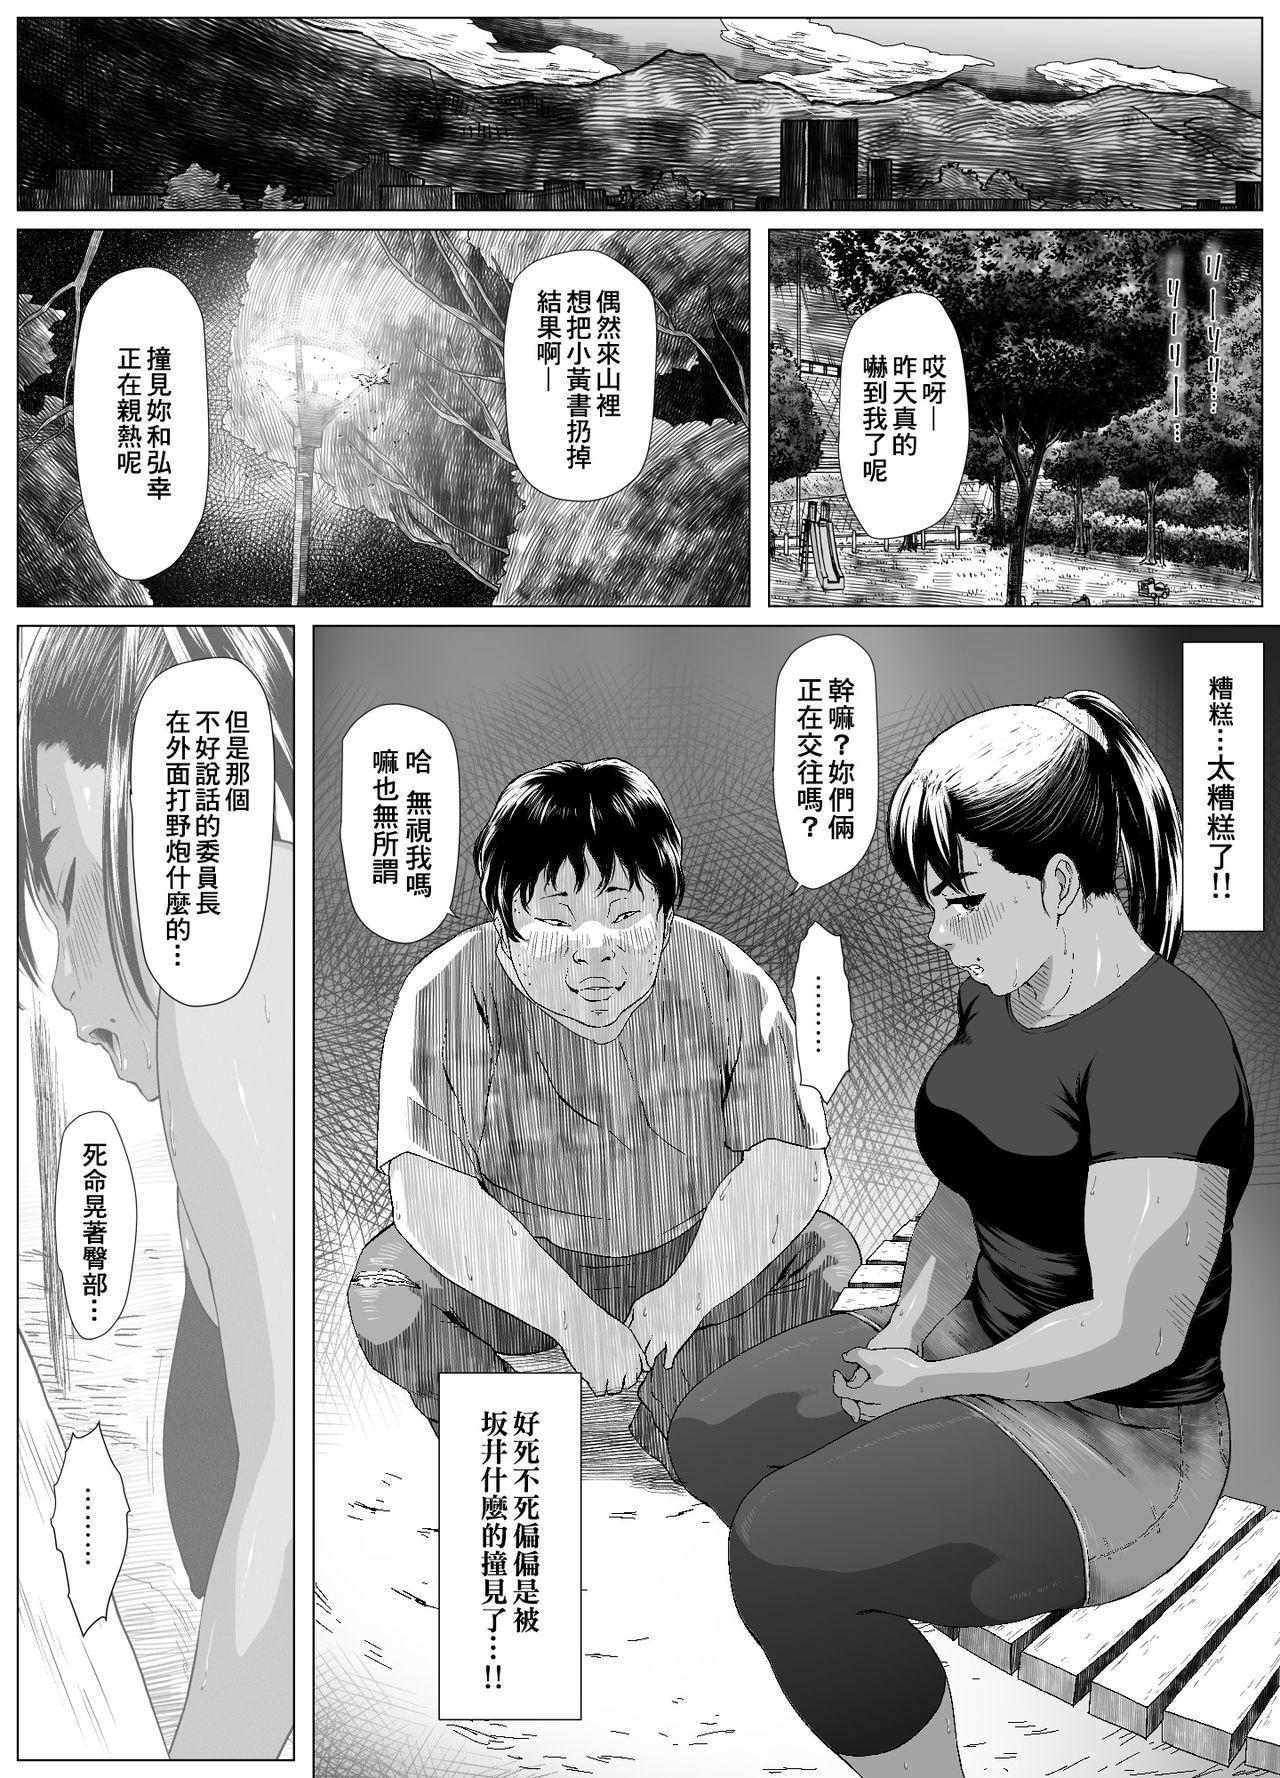 Koufukuron - Murase Ayumi Hen 1 11